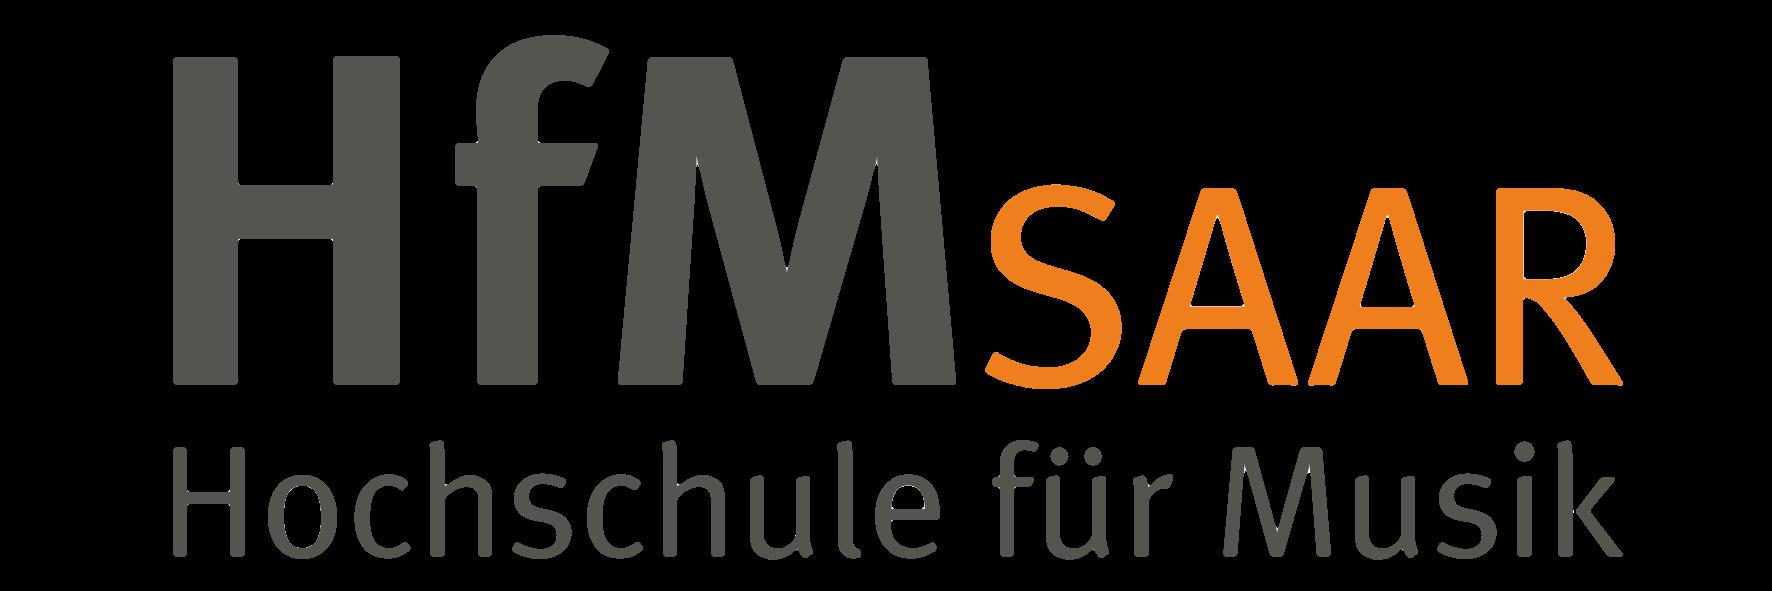 logo-alfa-hfm